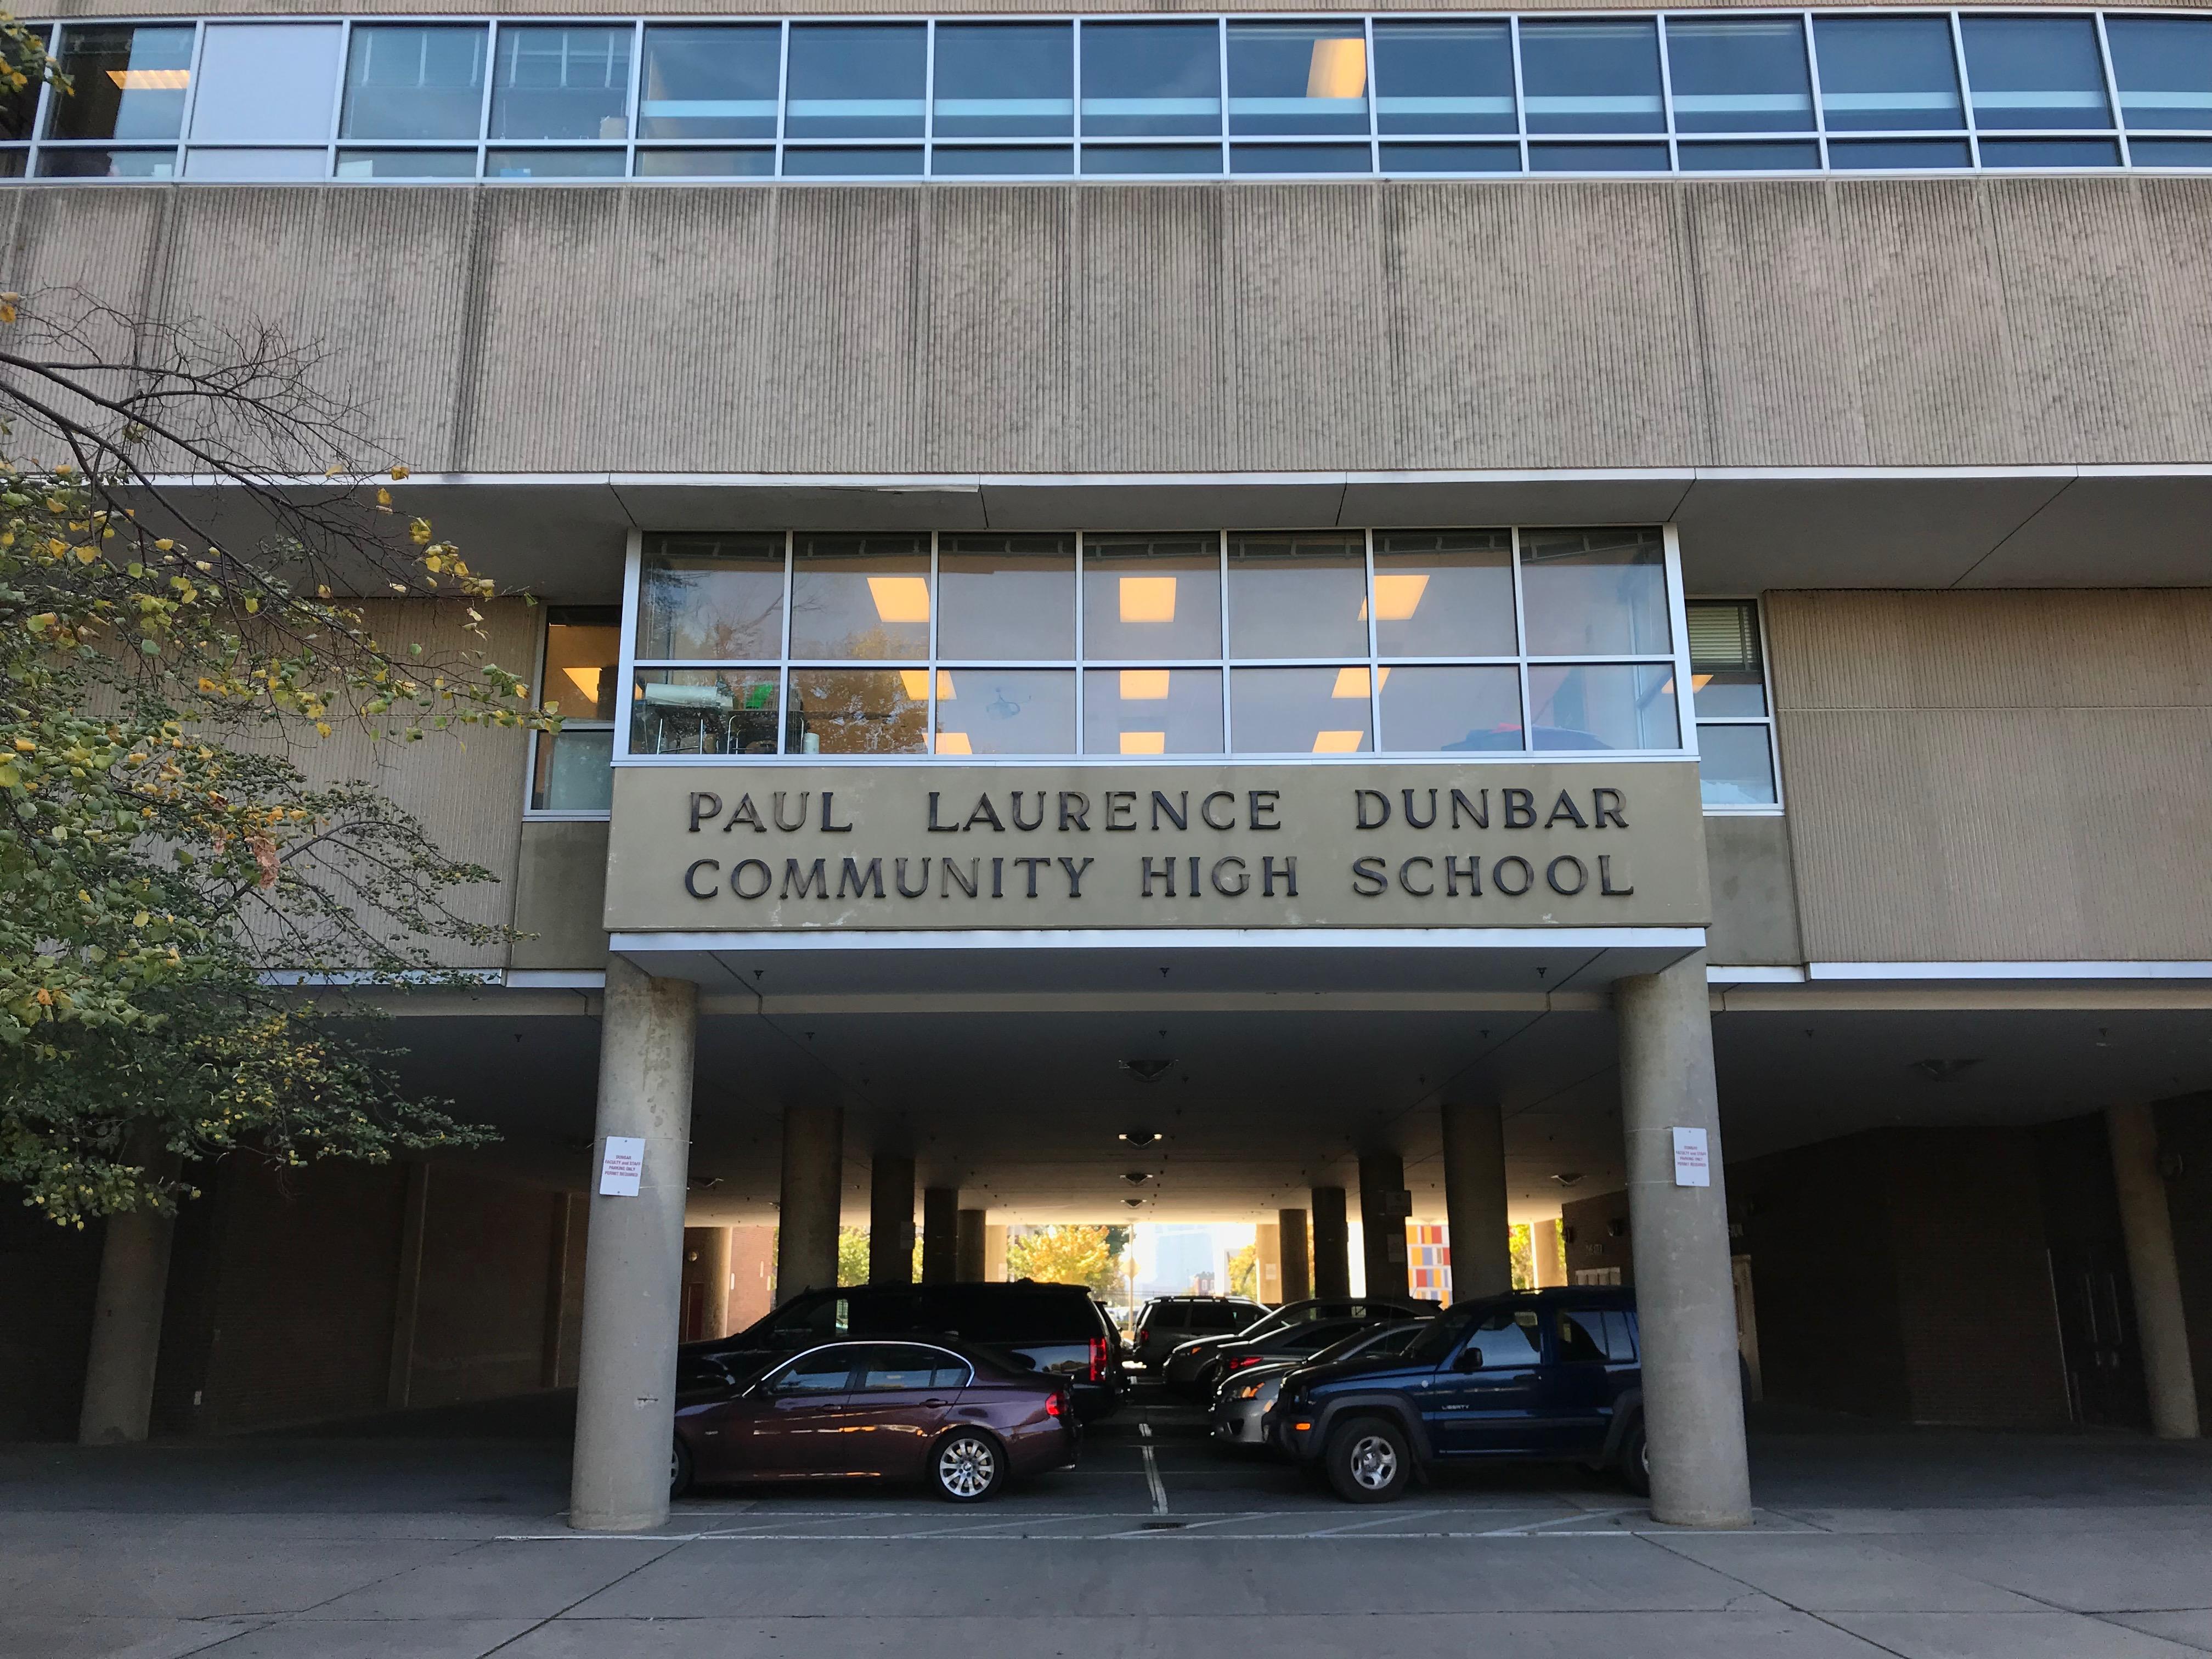 Paul laurence dunbar high school, 1400 orleans street, baltimore, md 21205 photo